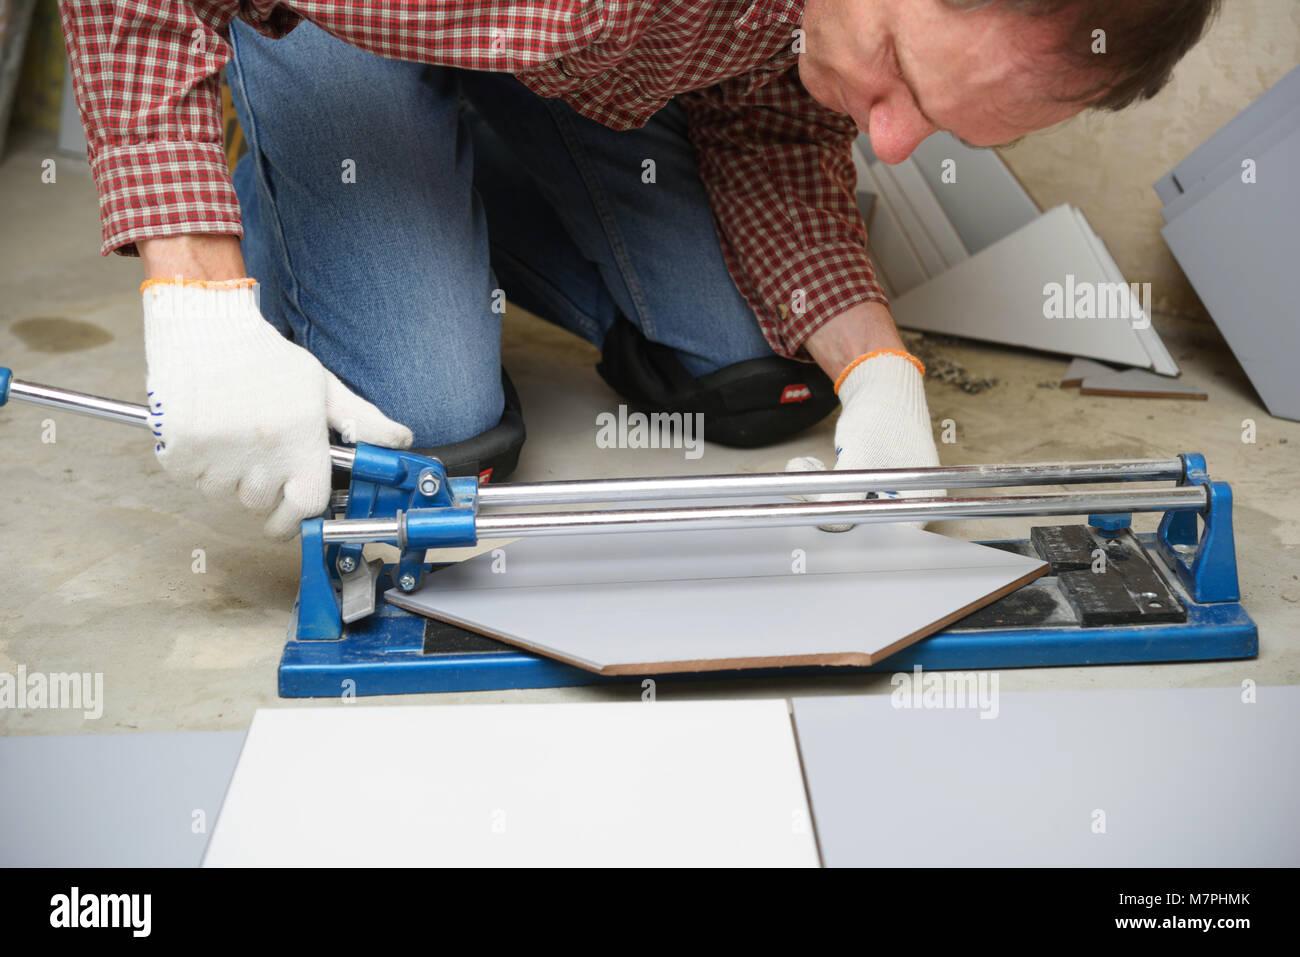 Tiler cutting ceramic tiles during floor installation stock photo tiler cutting ceramic tiles during floor installation dailygadgetfo Gallery